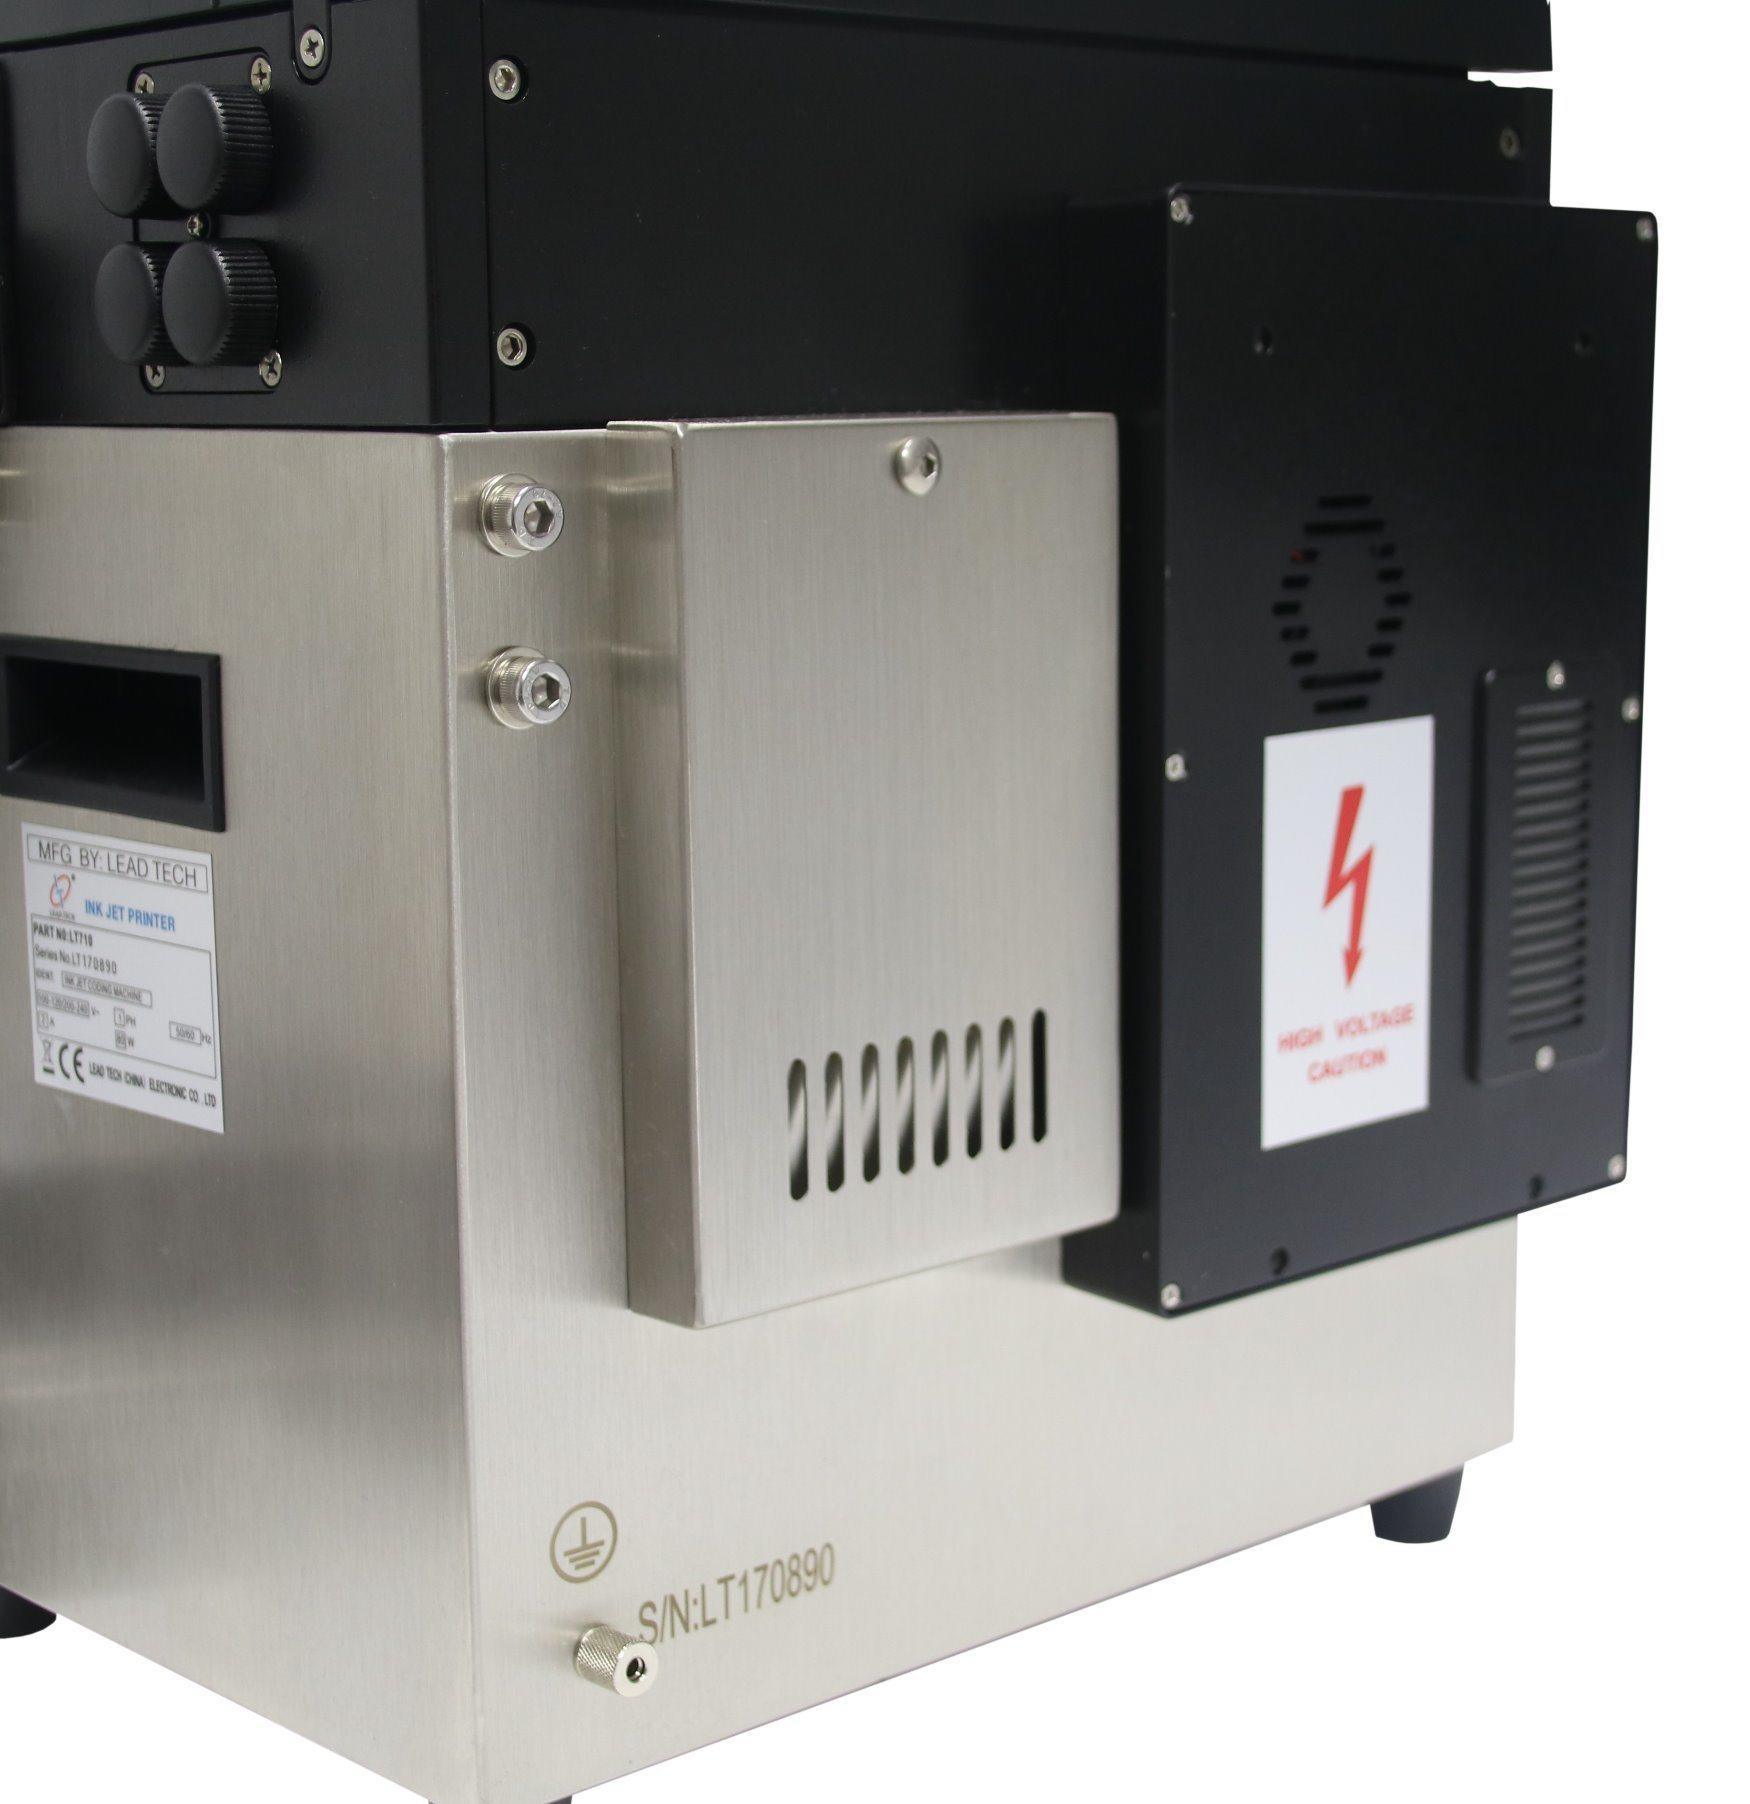 Lead Tech Lt760 Cij Inkjet Printer for Black to Red Coding